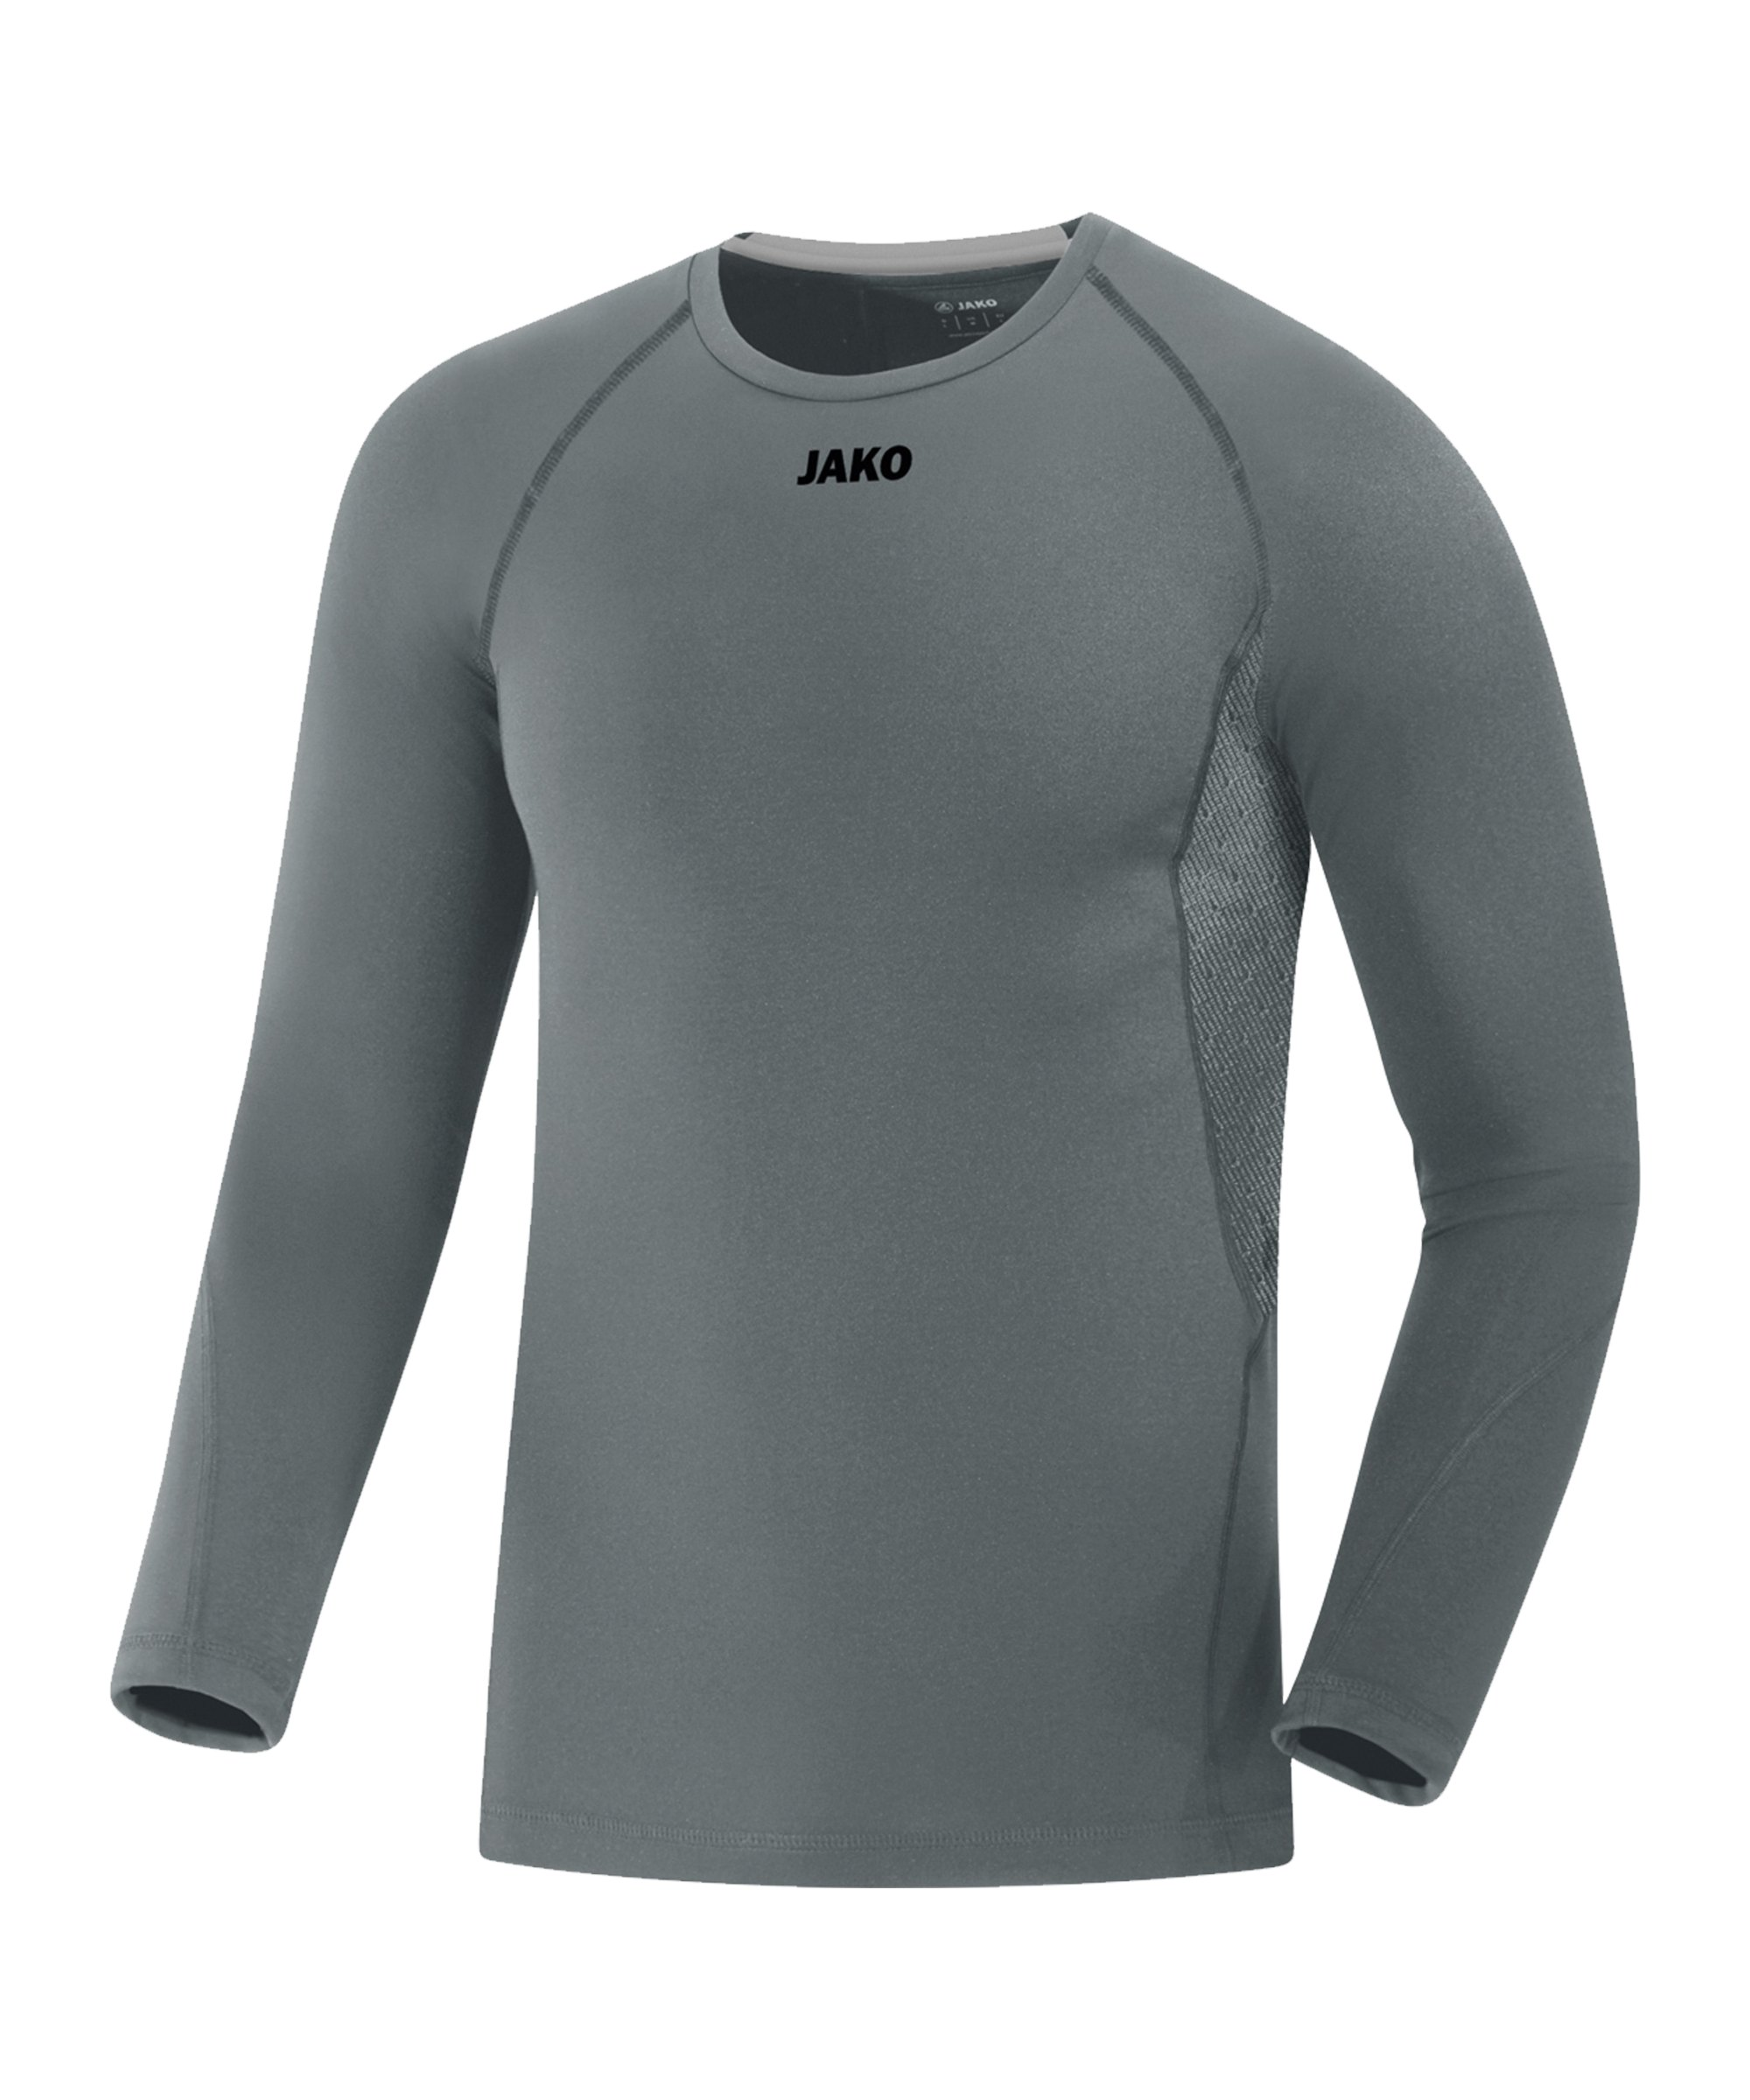 JAKO Compression 2.0 Longsleeve Grau F40 - grau